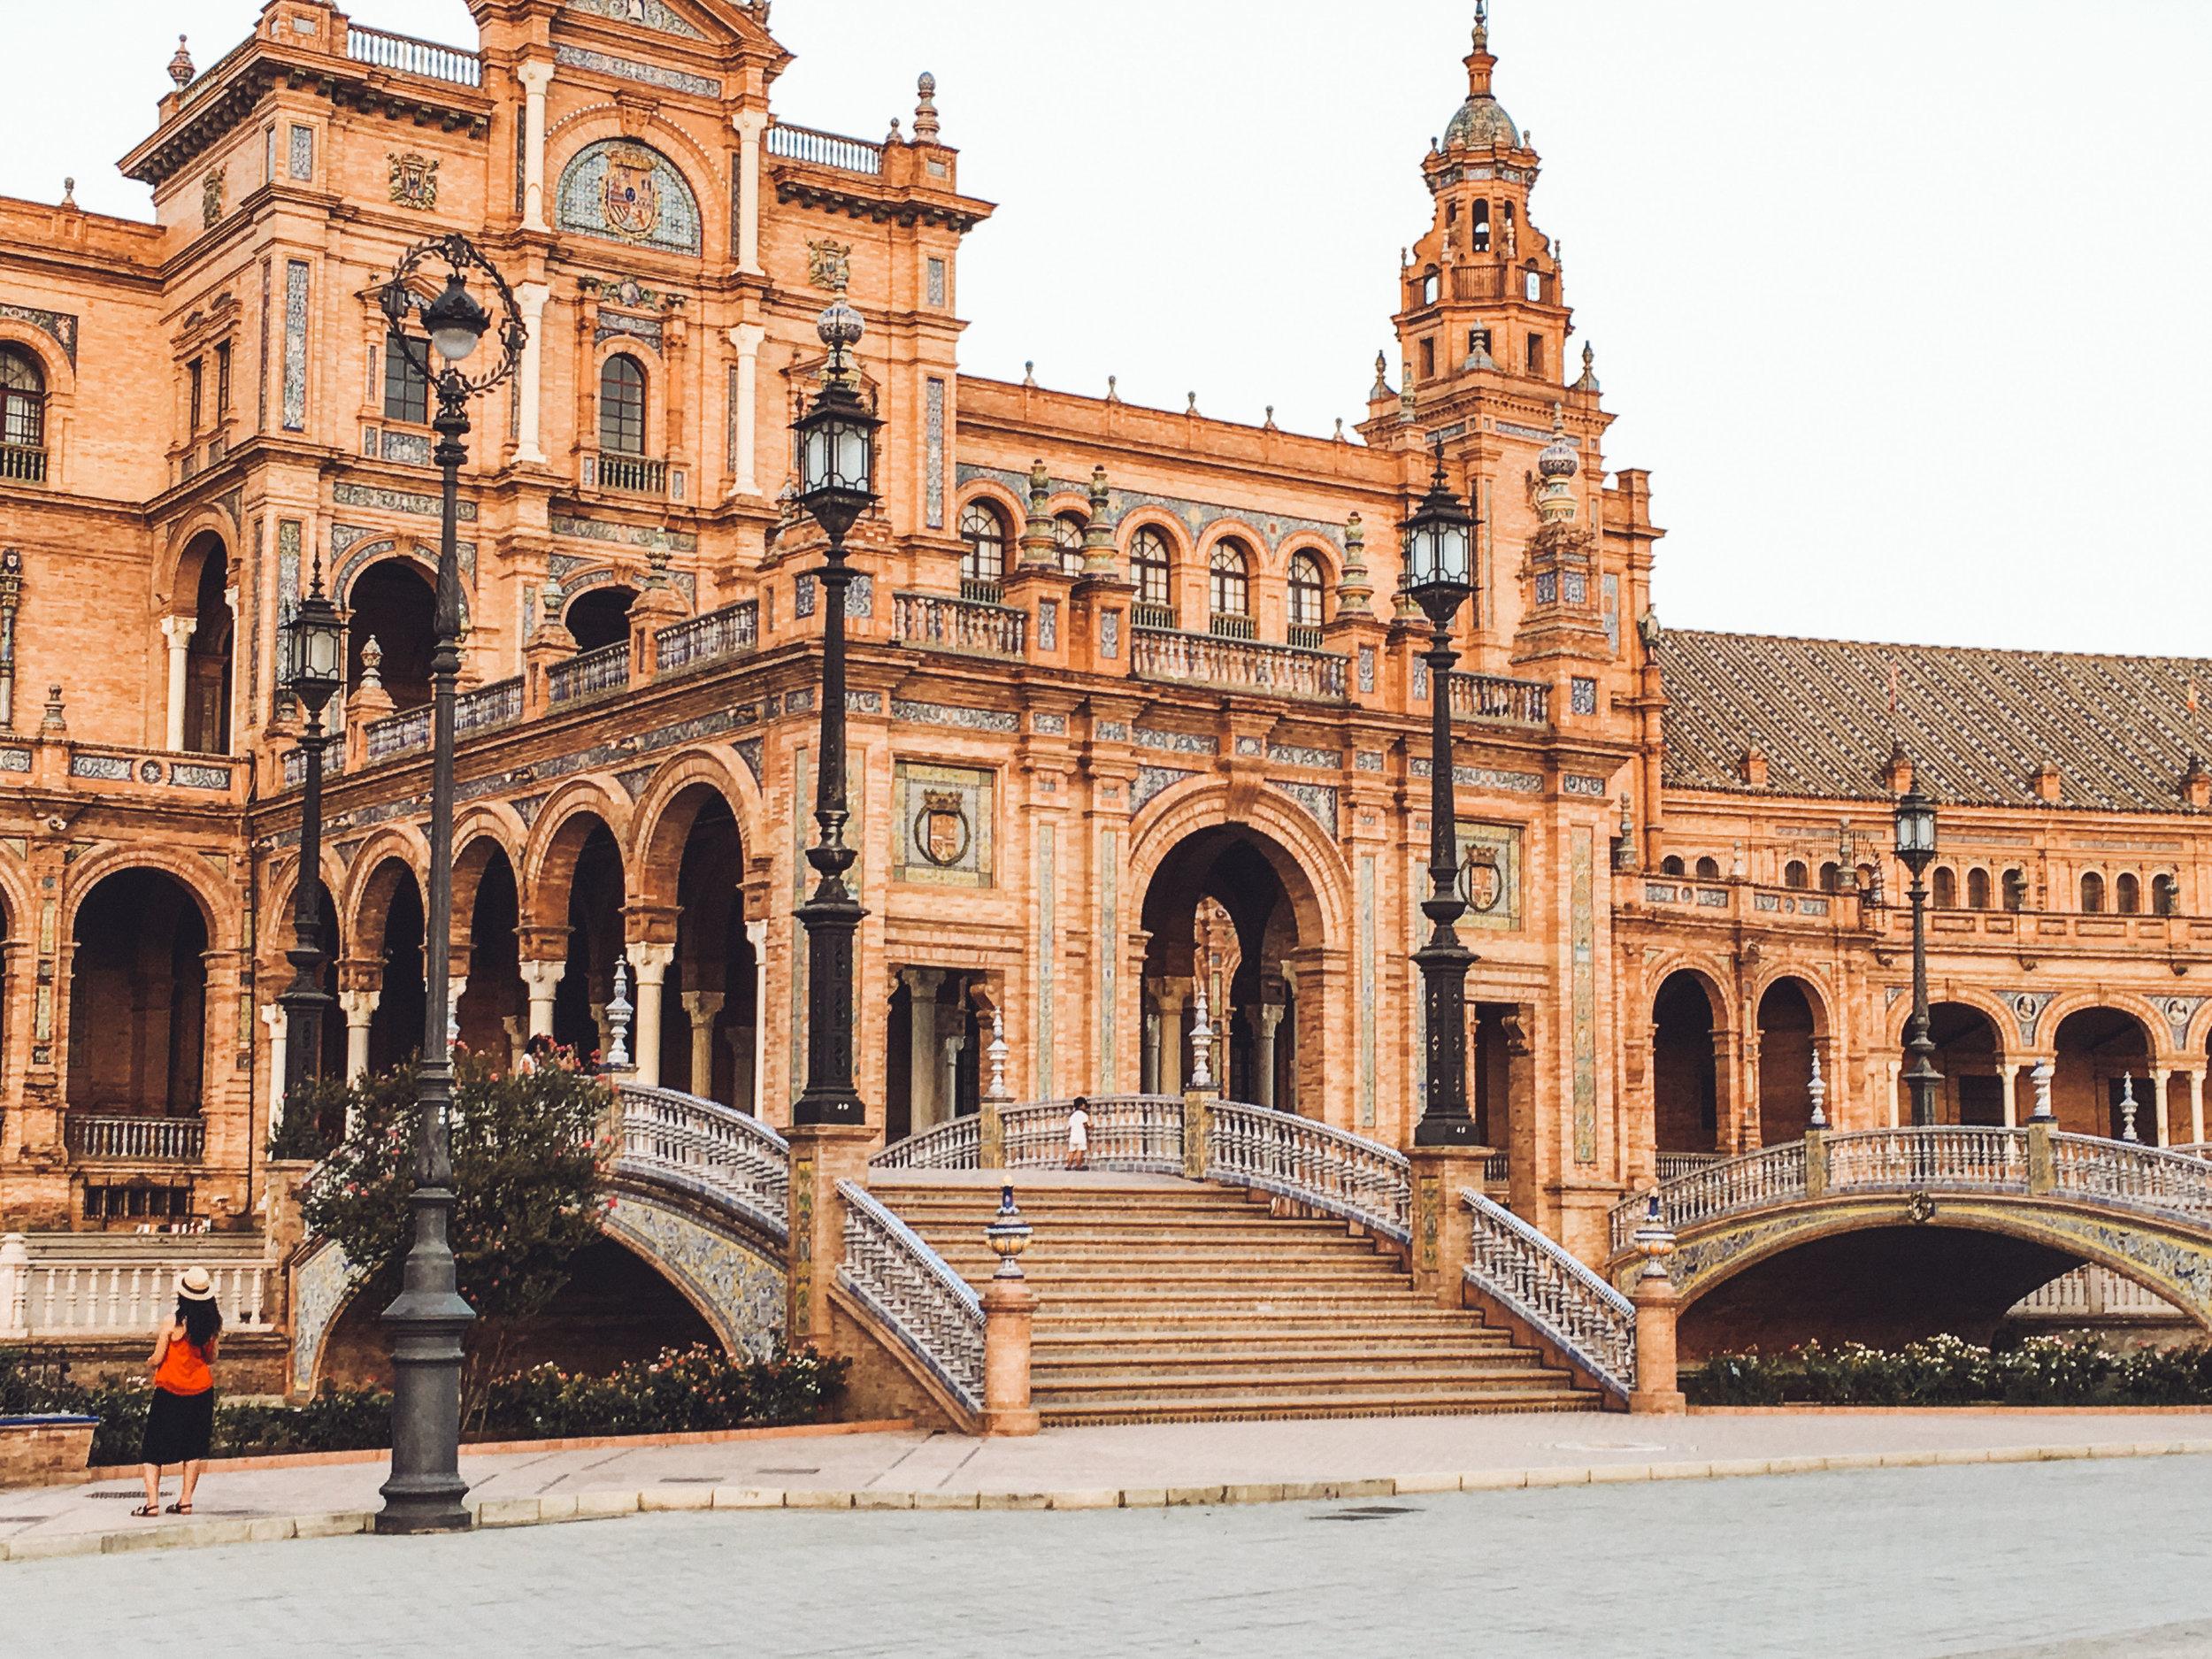 La Plaza de Espagna